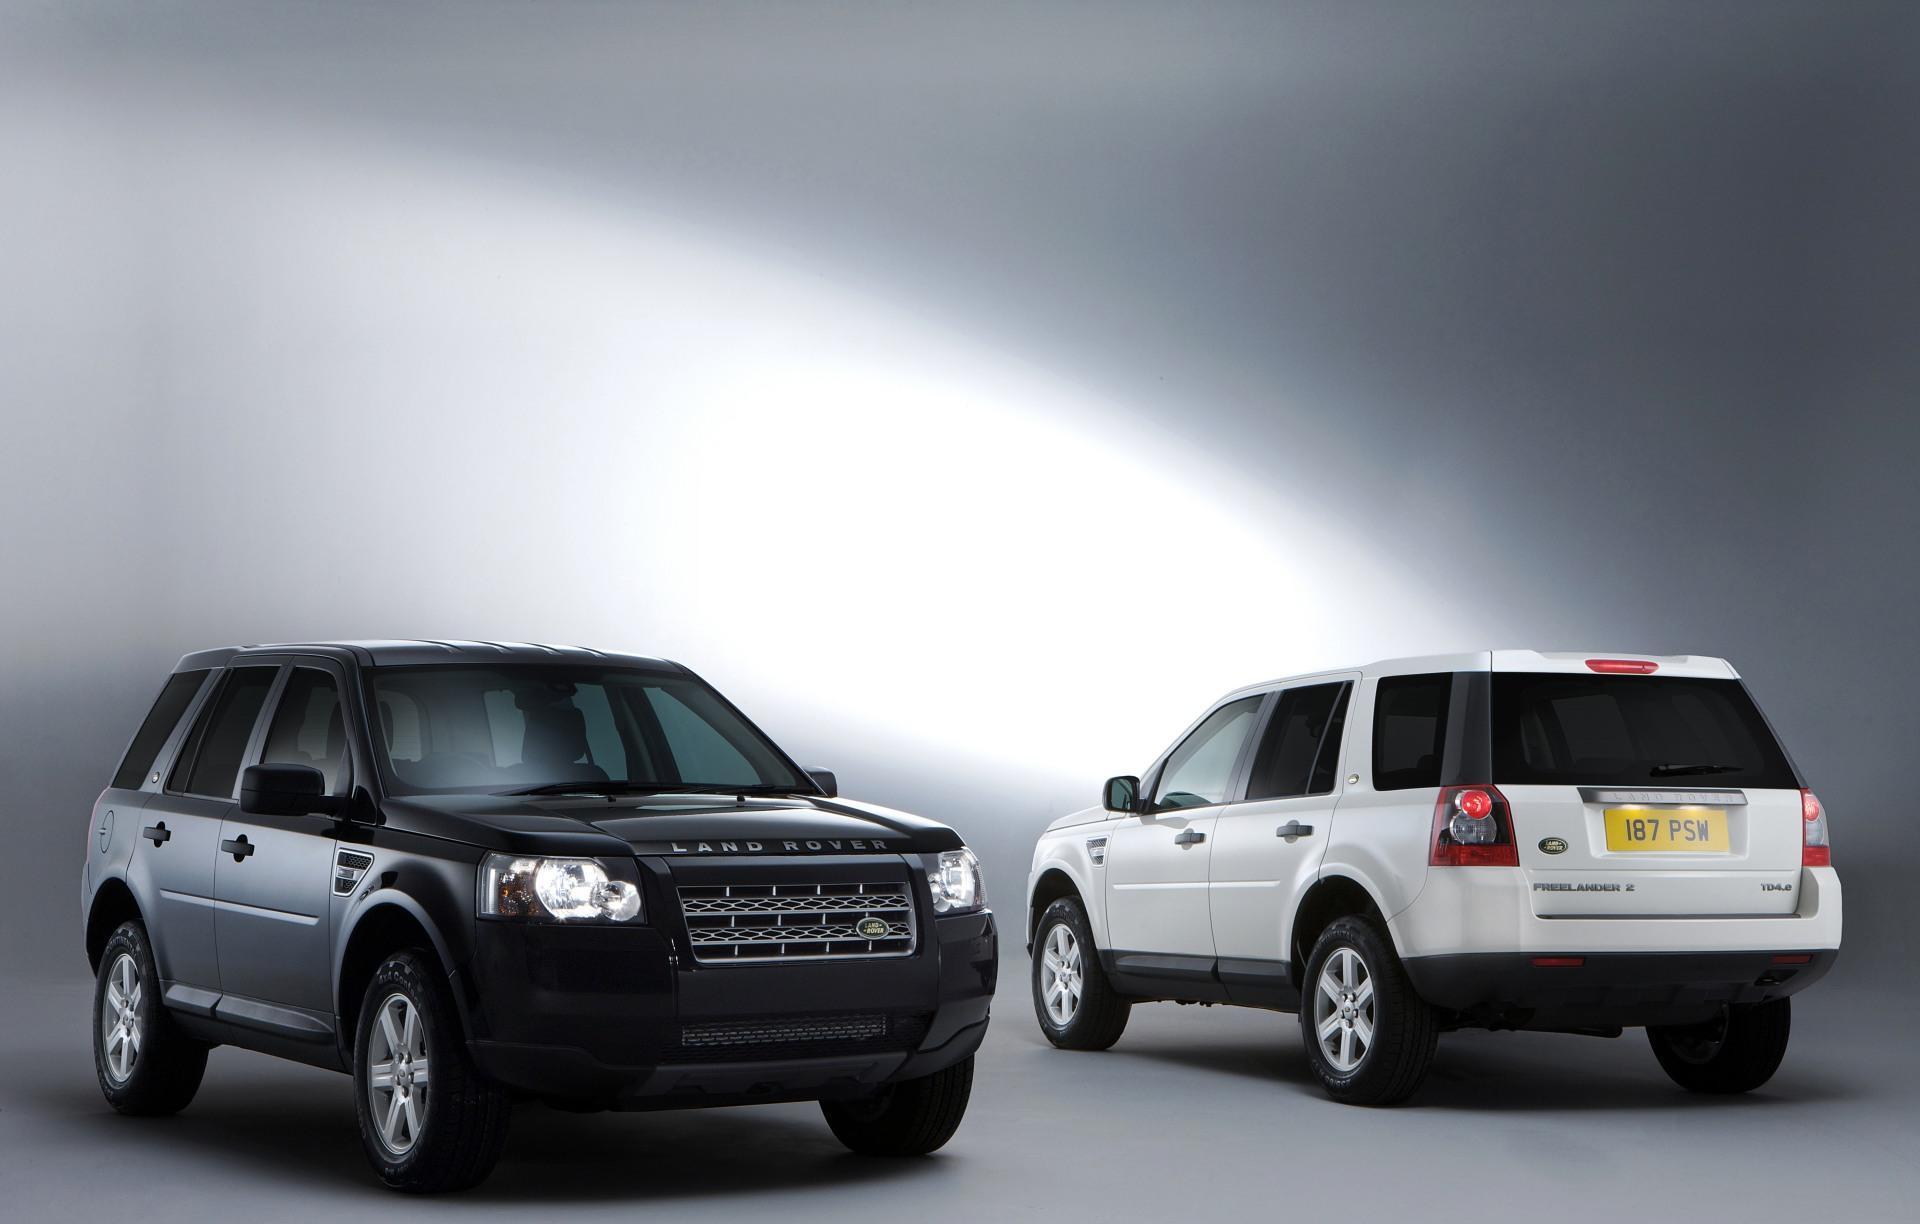 test drive the car land rover freelander 2 wallpapers and. Black Bedroom Furniture Sets. Home Design Ideas